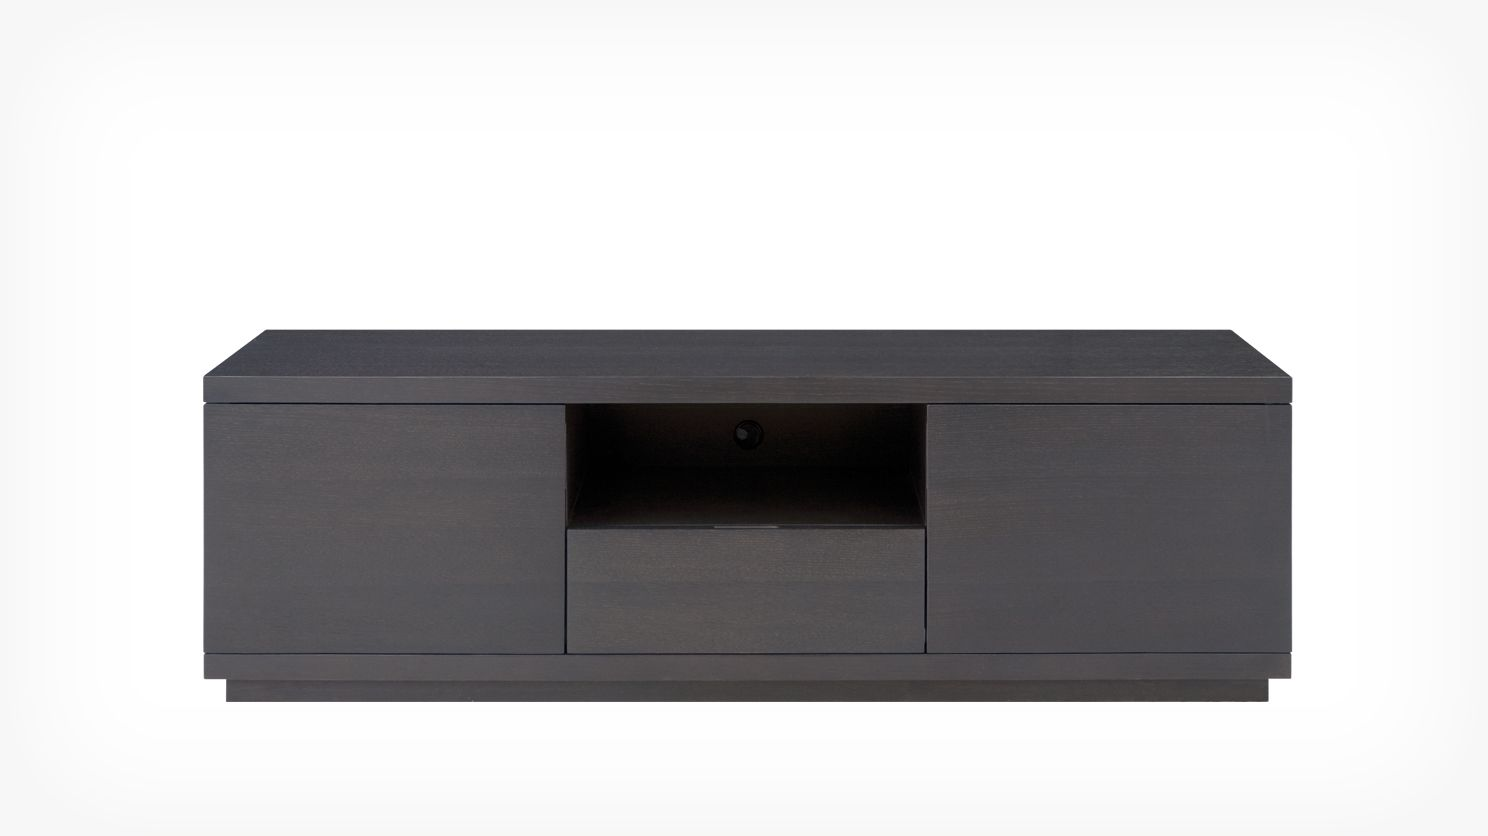 Merveilleux Boom Plasma Unit | EQ3 Modern Furniture. Shelving IdeasMain StreetModern ...